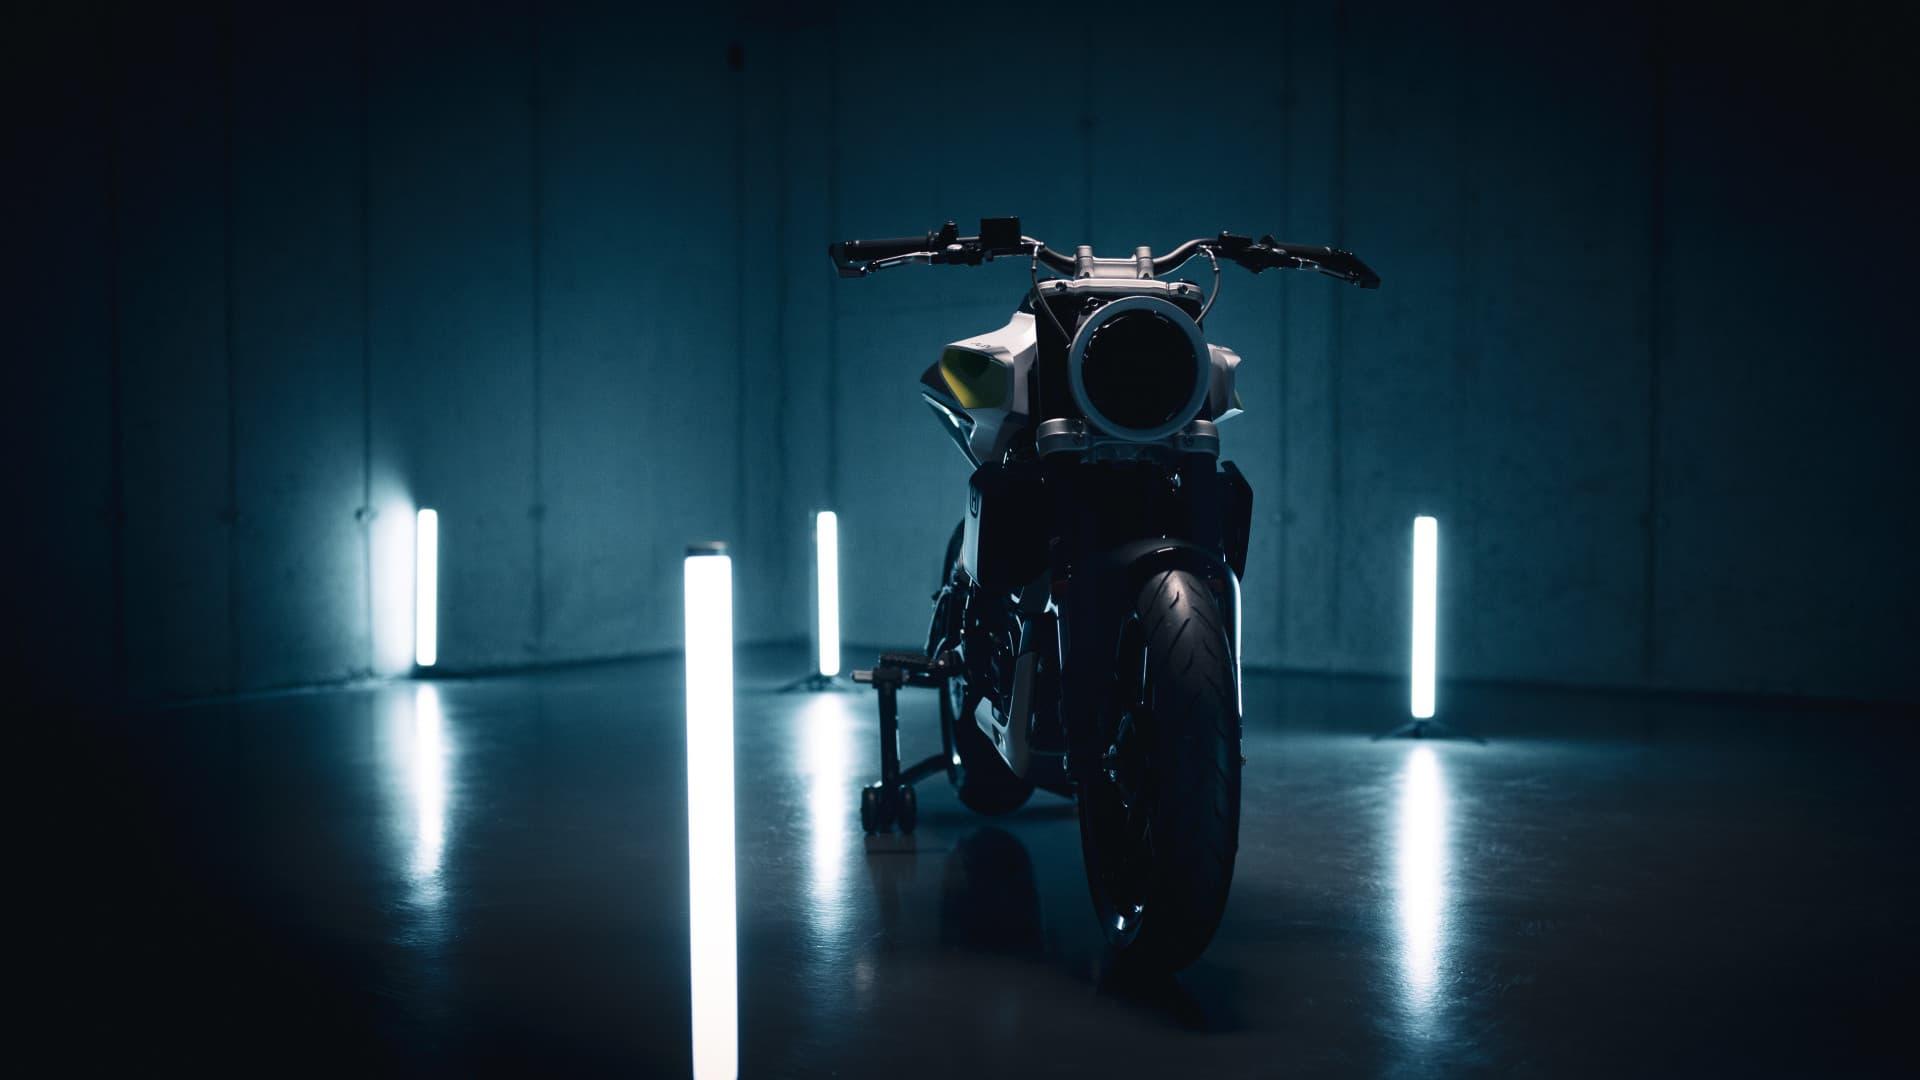 Husqvarna E Pilen Concept Moto Electrica 01